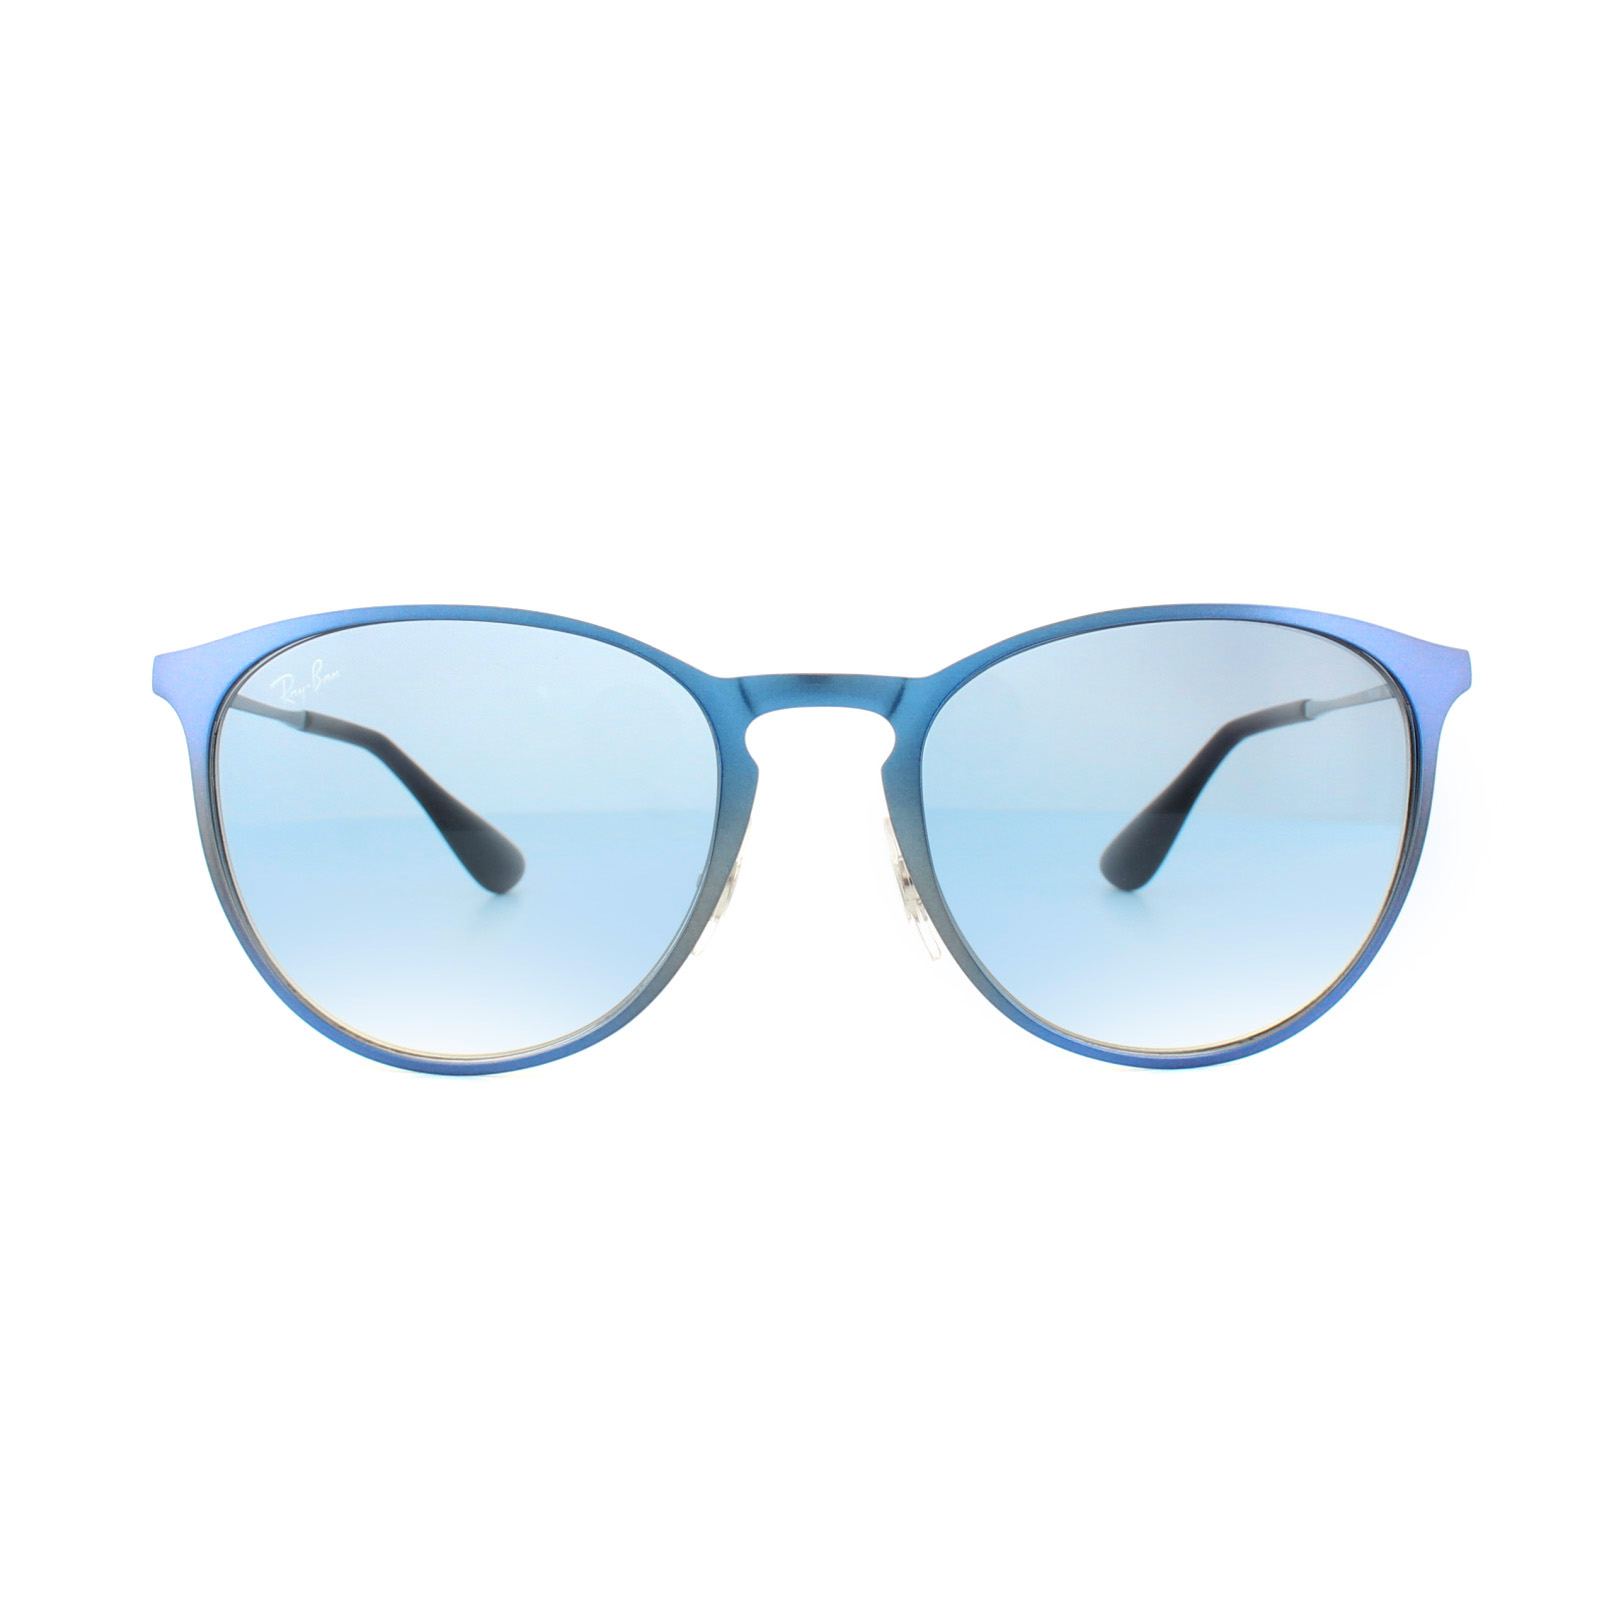 4565e90b15 Sentinel Ray-Ban Sunglasses Erika Metal 3539 194 19 Metalic Shot Blue Light  Blue Gradient